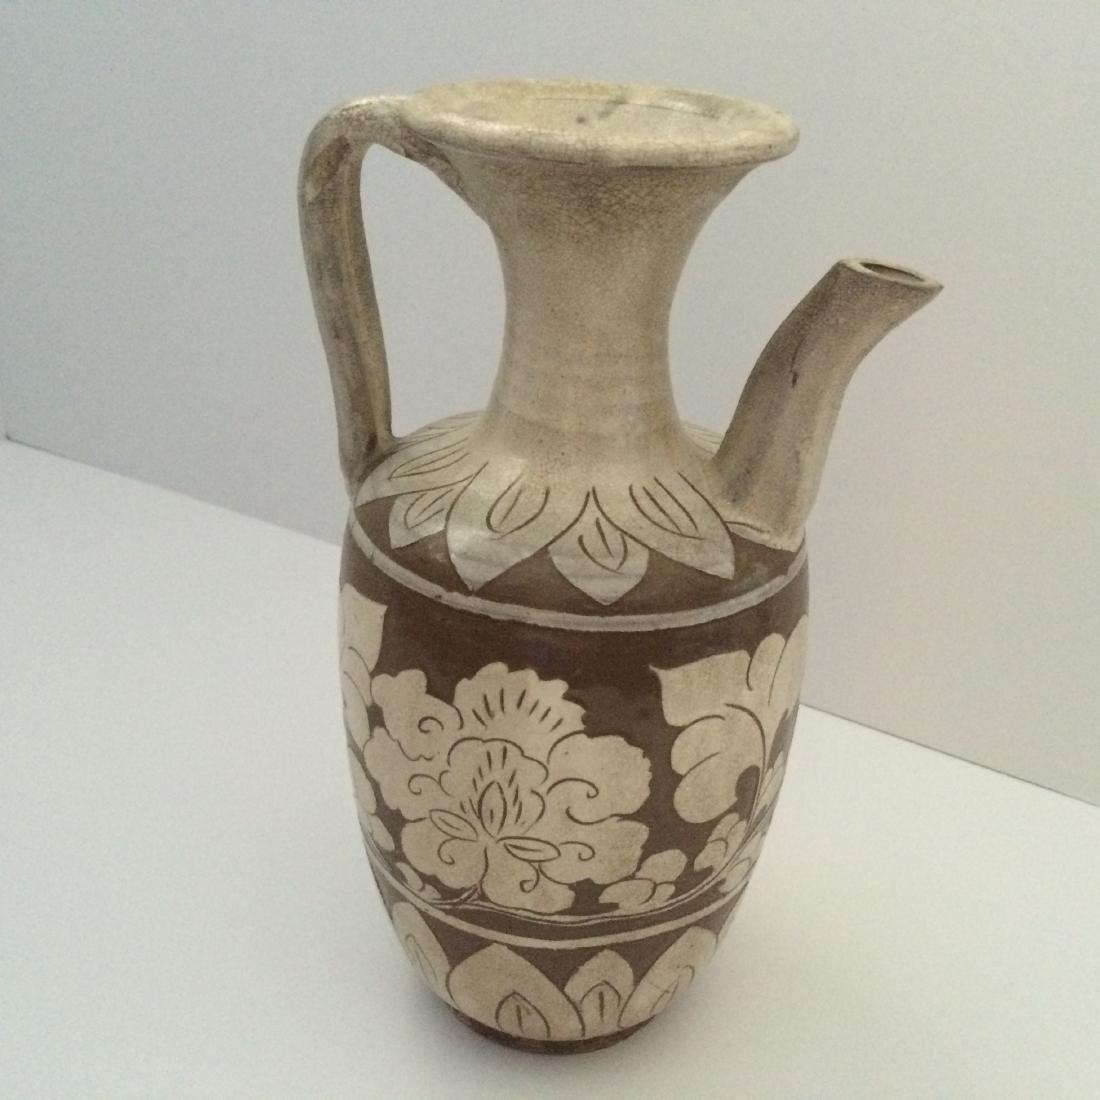 "Chinese Liao Dynasty Ceramic Ci Zhou Ware Pitcher 10""H - 3"